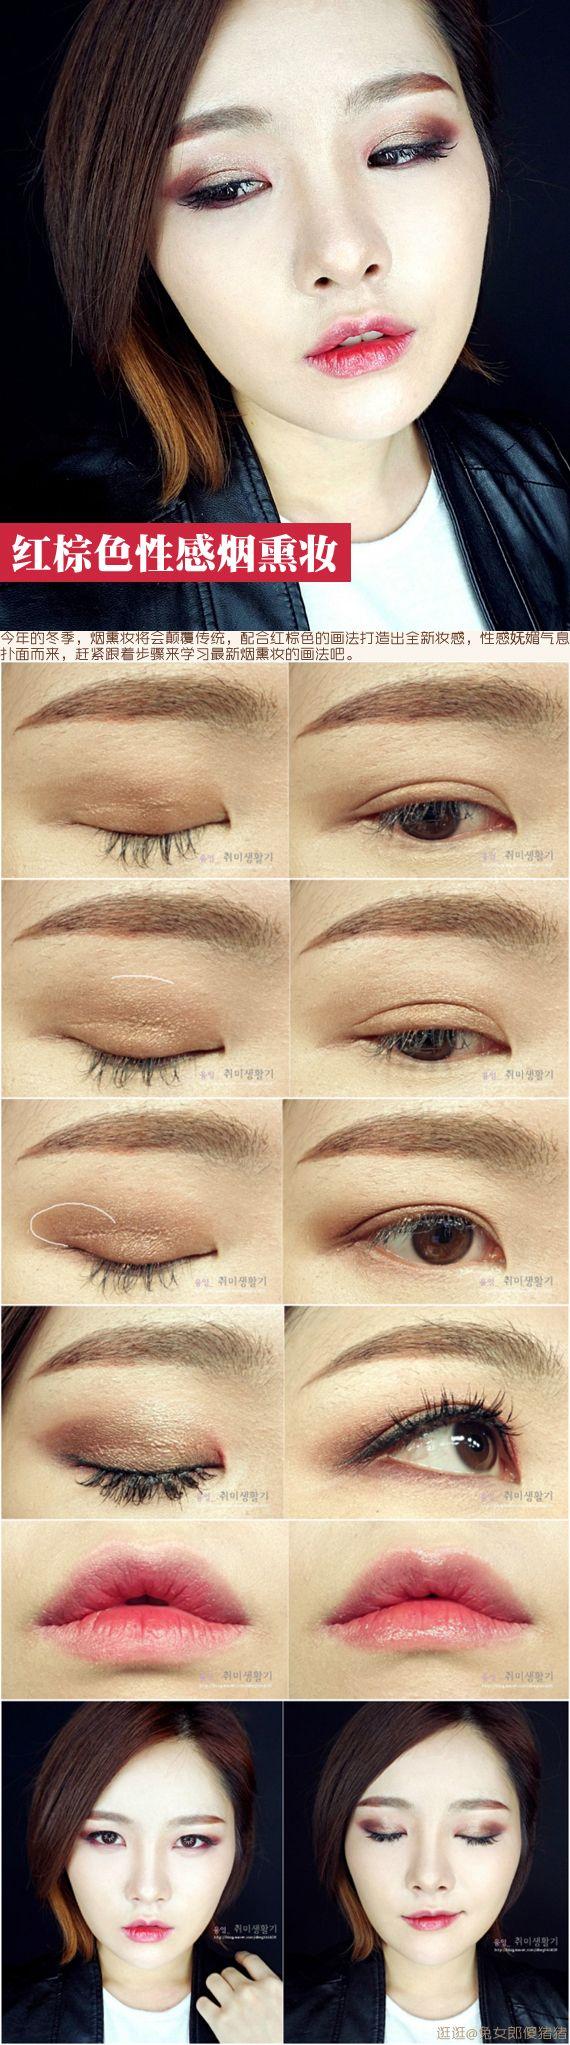 japanese/korean make up tutorial   ️ #ClassyLadyEntrepreneur www.AsianSkincare.Rocks